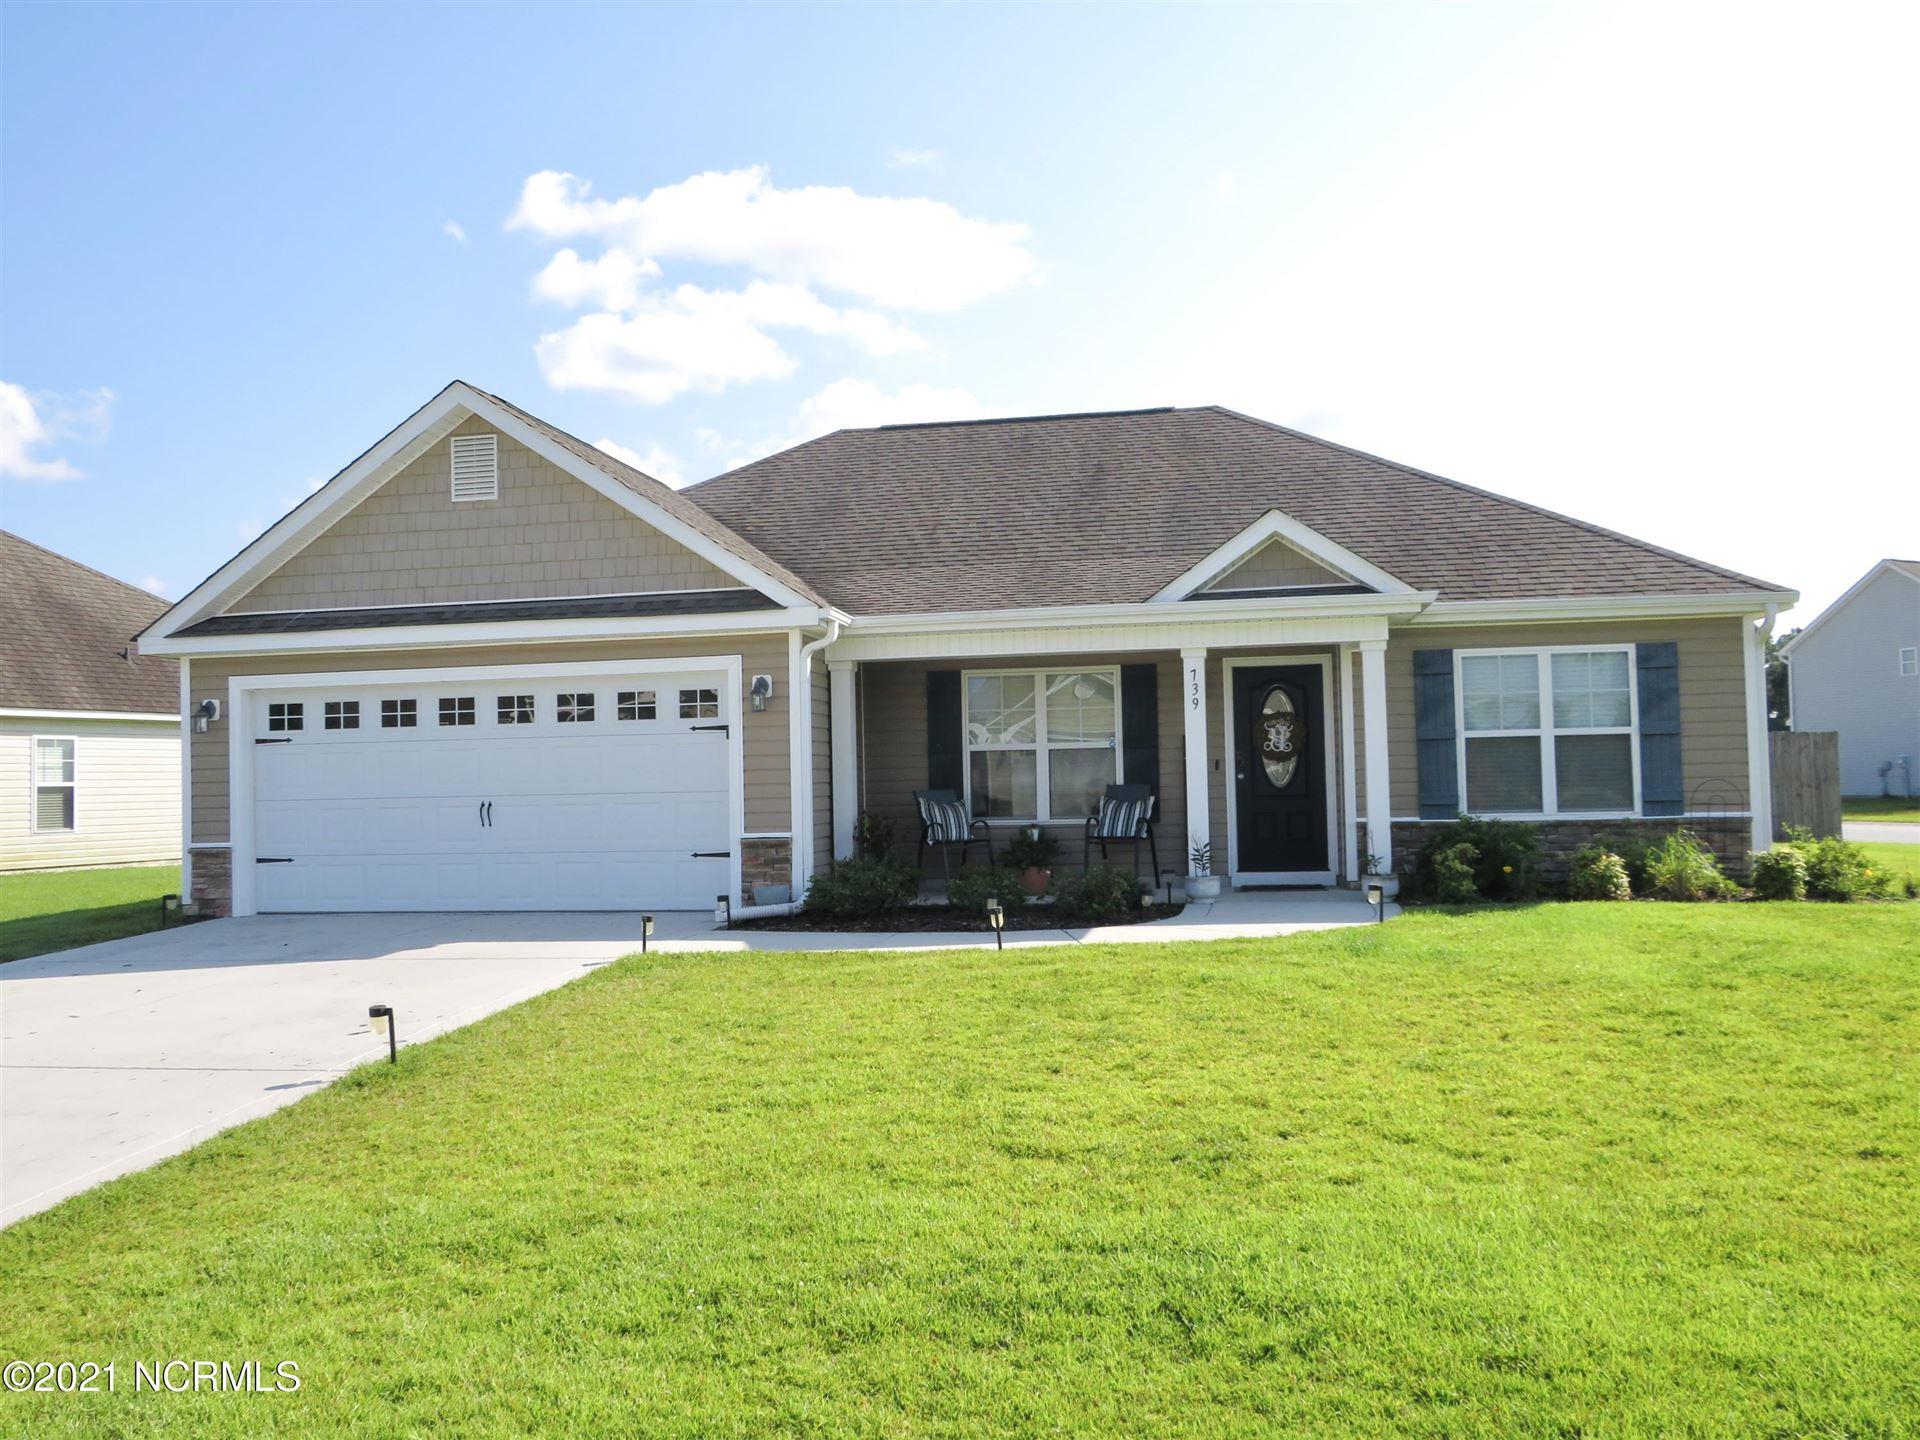 Photo of 739 Radiant Drive, Jacksonville, NC 28546 (MLS # 100285835)